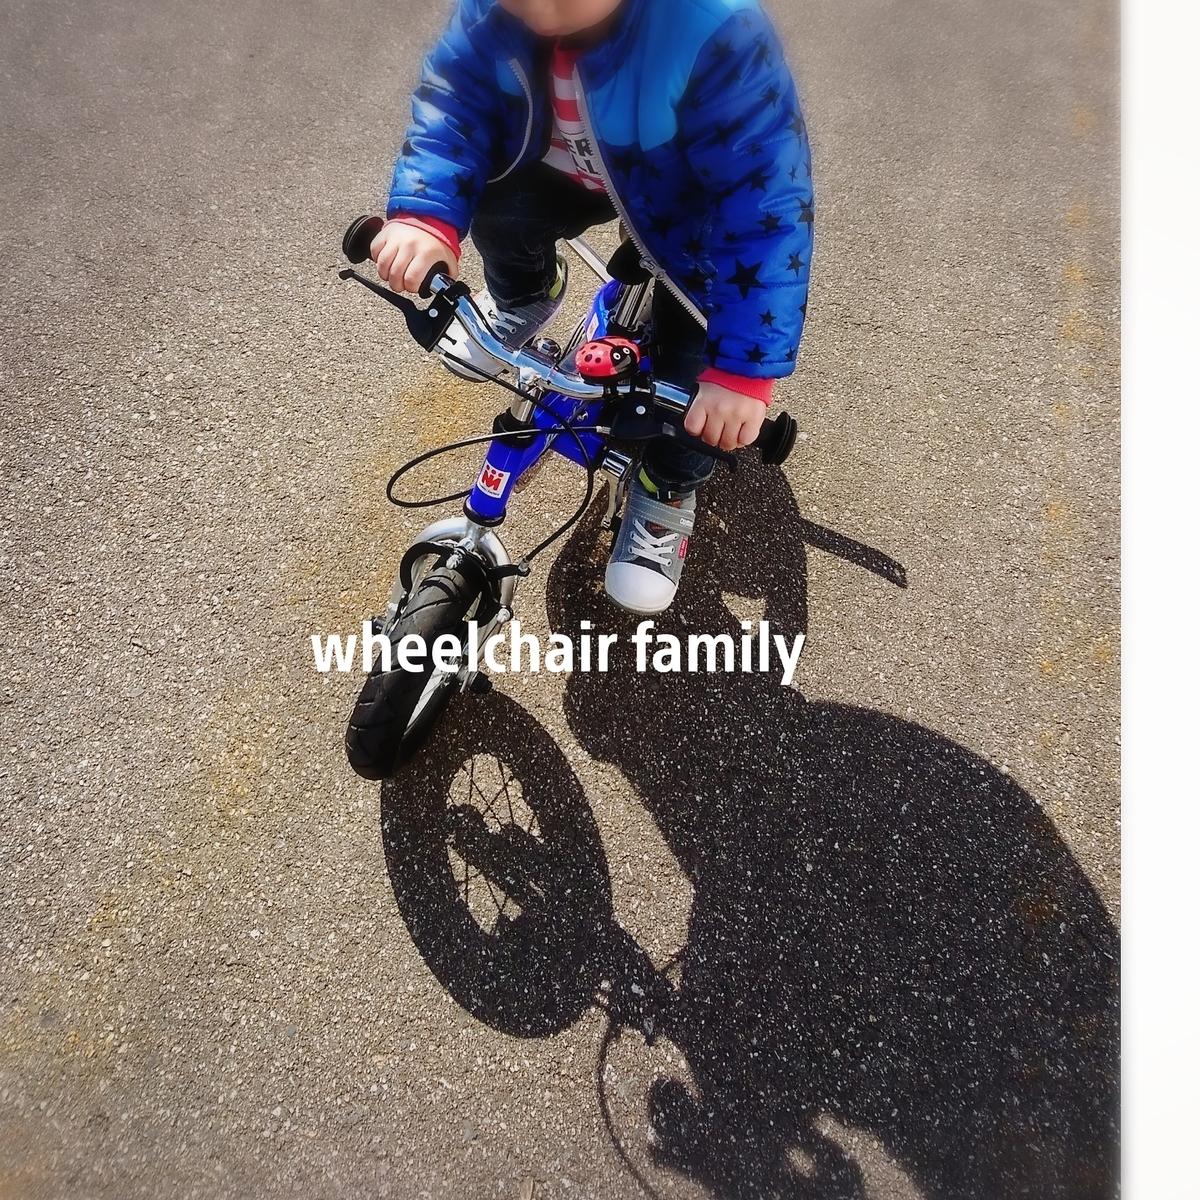 f:id:WheelchairFamily:20200529210240j:plain